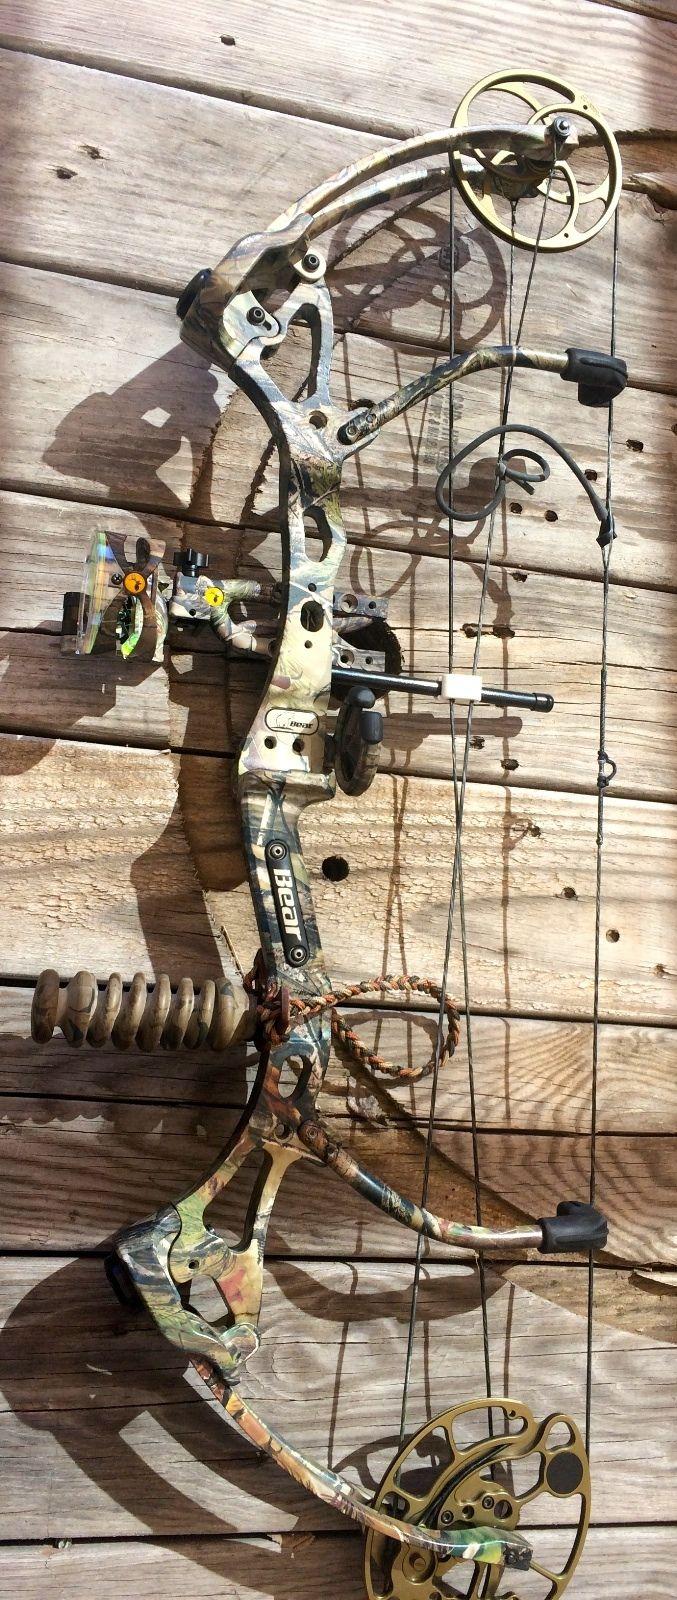 Bear Archery Assault Compound Bow